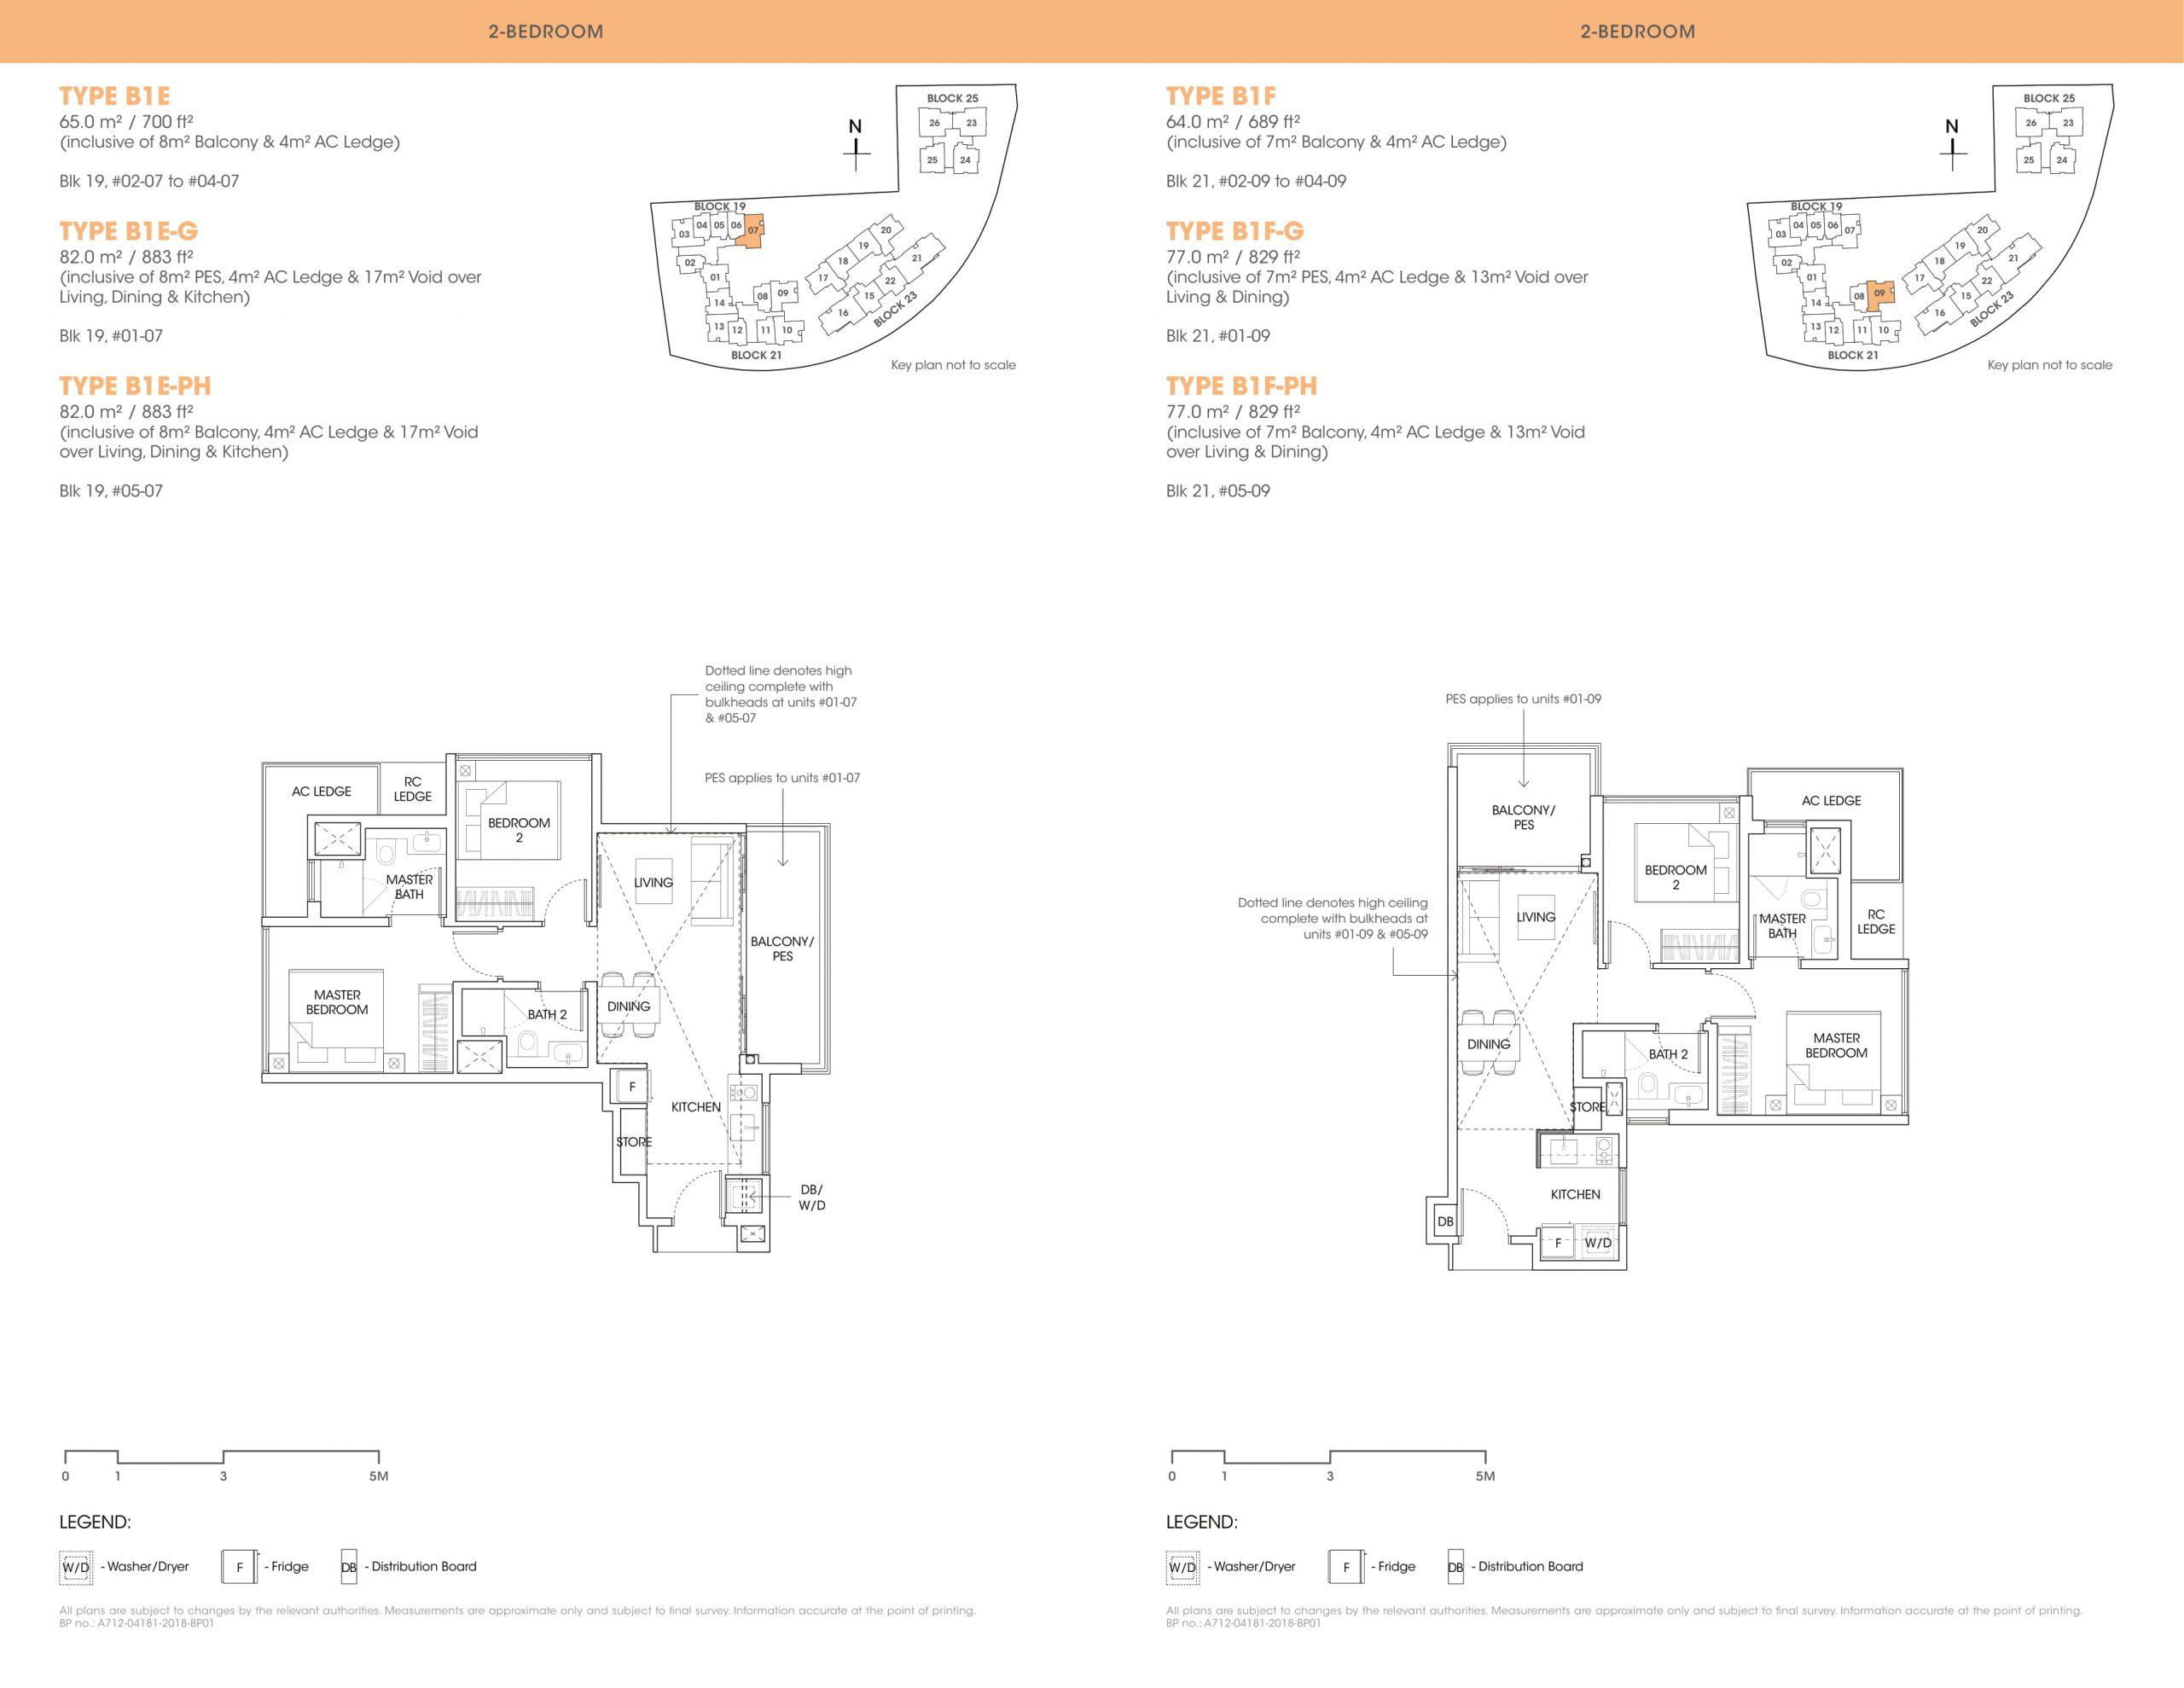 The Antares two-bedroom floor plan